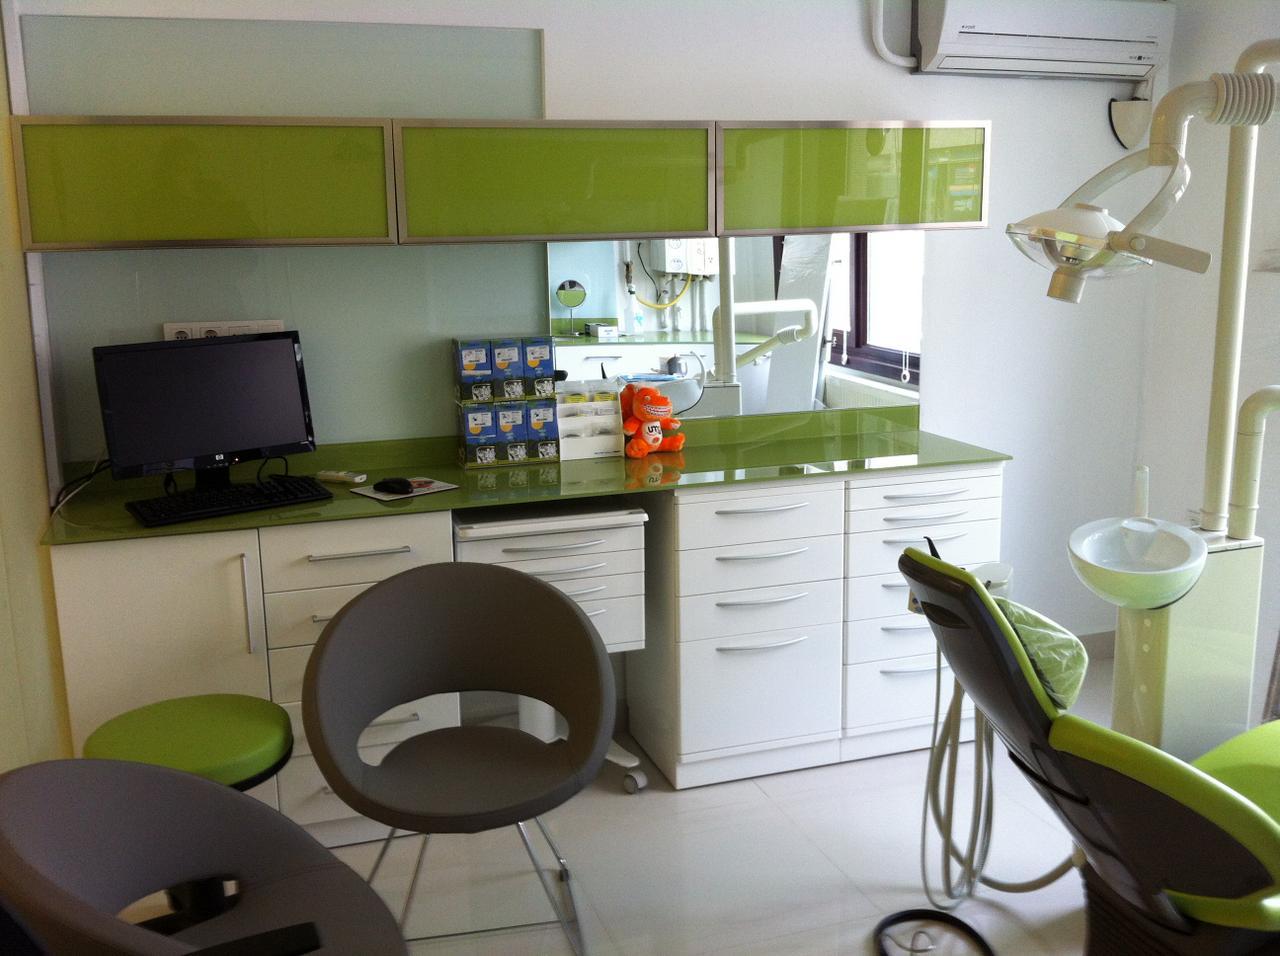 BilgeIldiri_DentalClinic-7.JPG